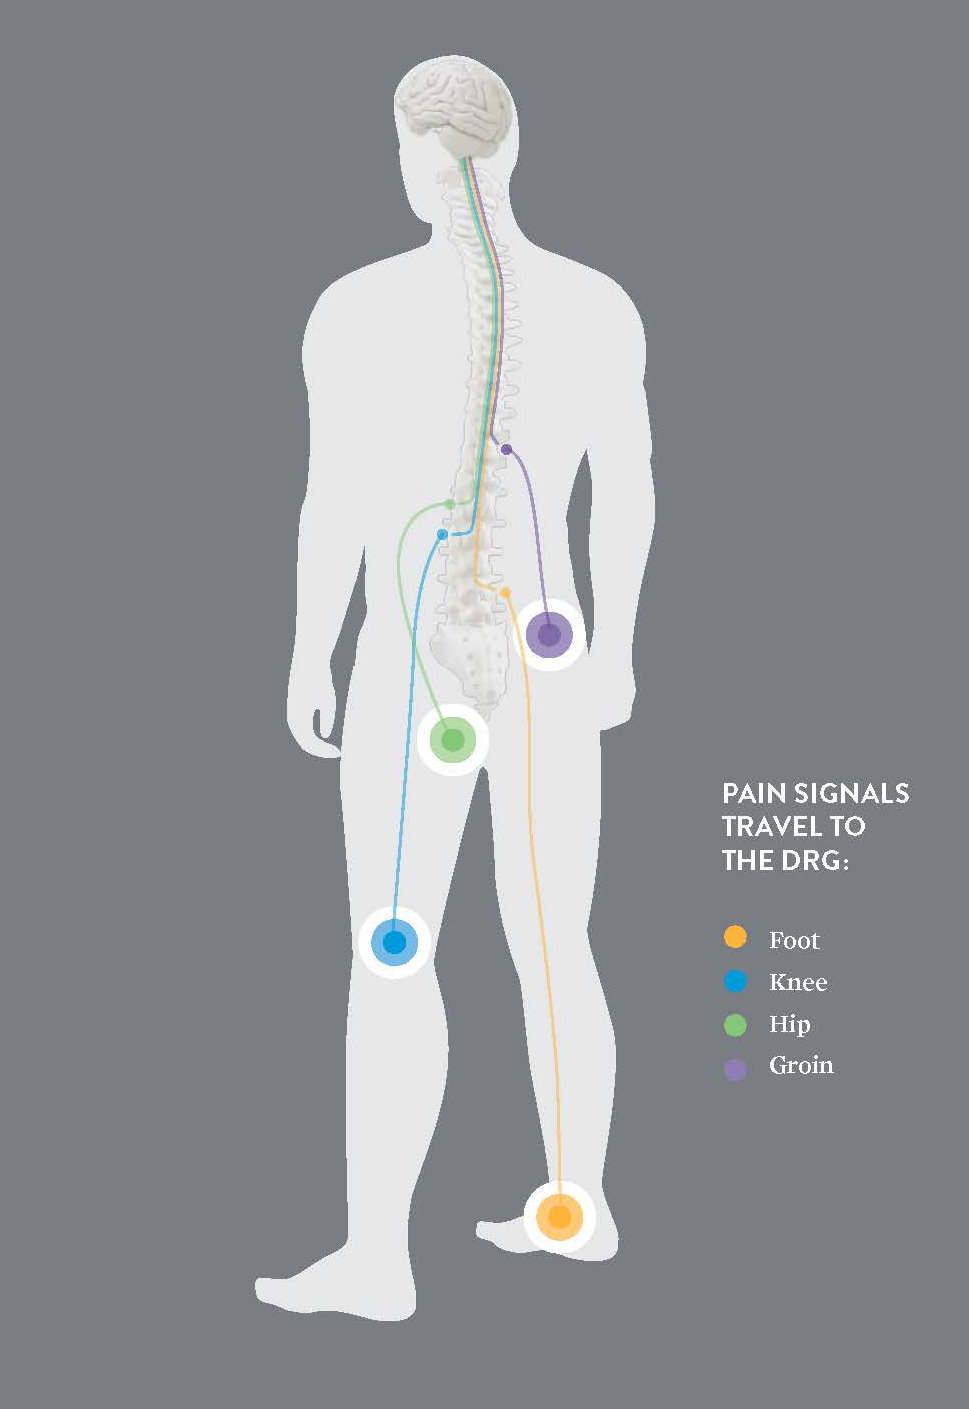 Dorsal Root Ganglion Drg Advanced Paincare Dr Michael Fishell